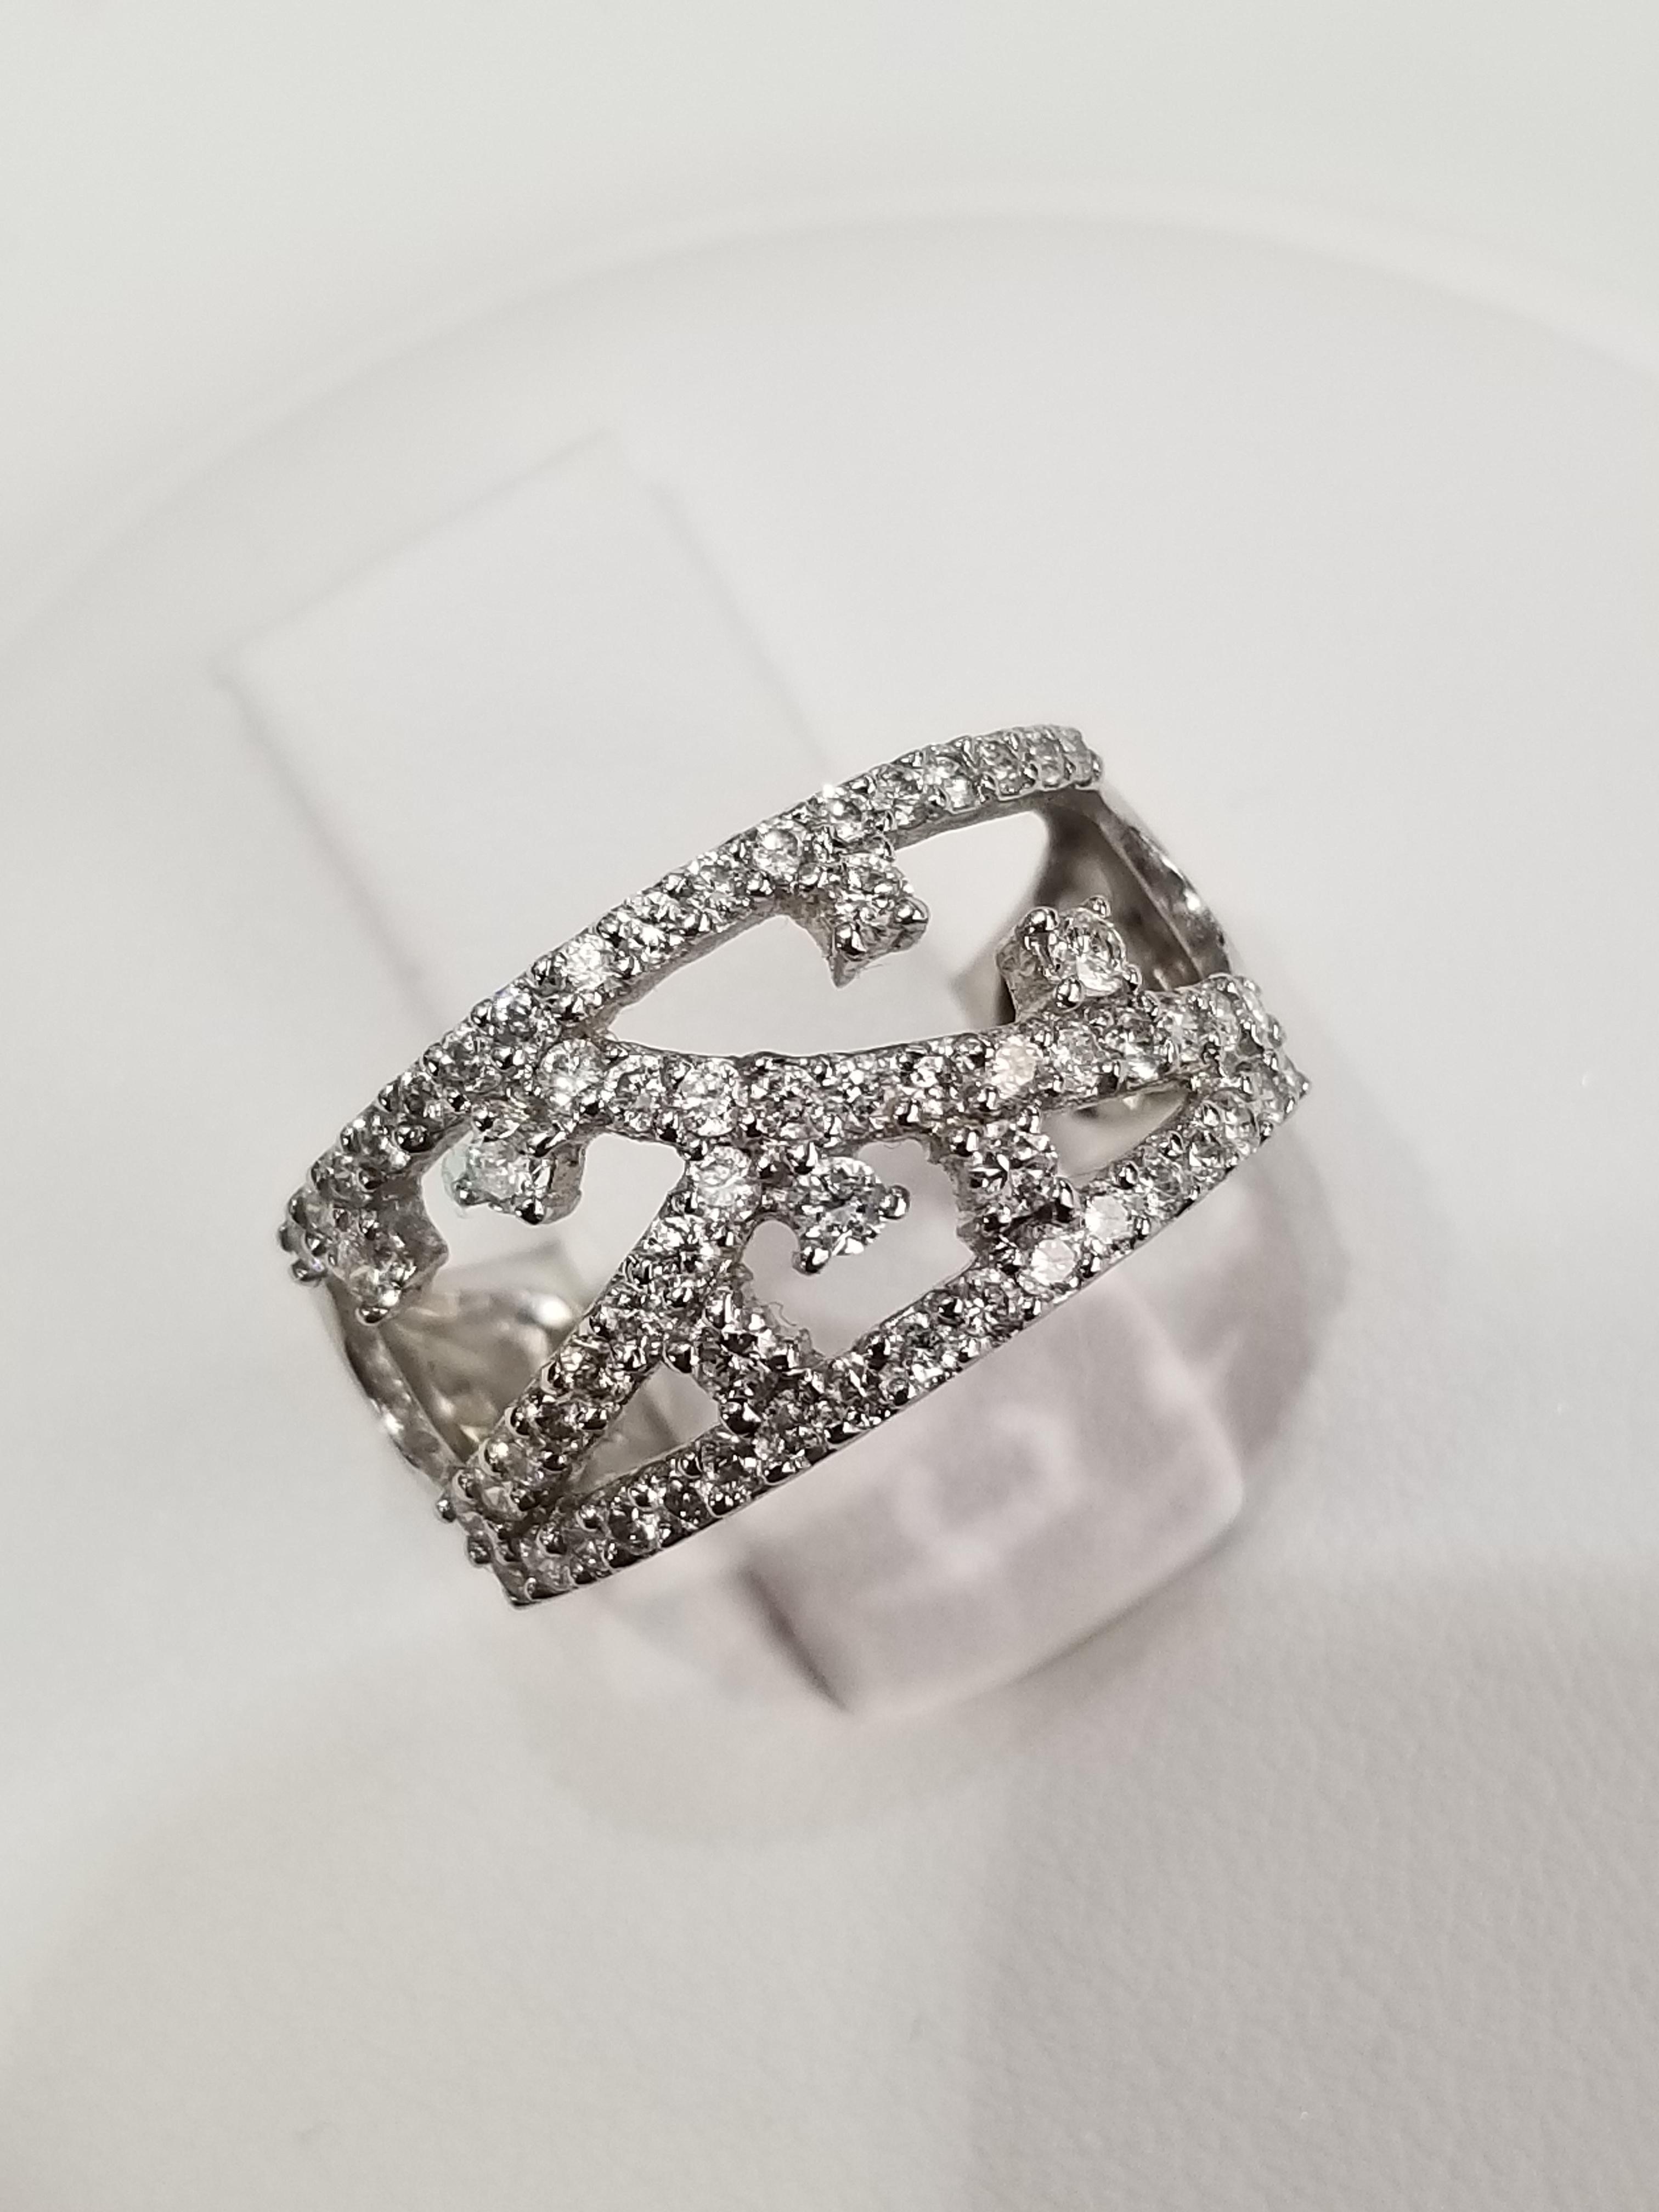 18K White Gold Diamonds: 0.90ct Regular Price $4975 SALE $1325 Ref: BK350